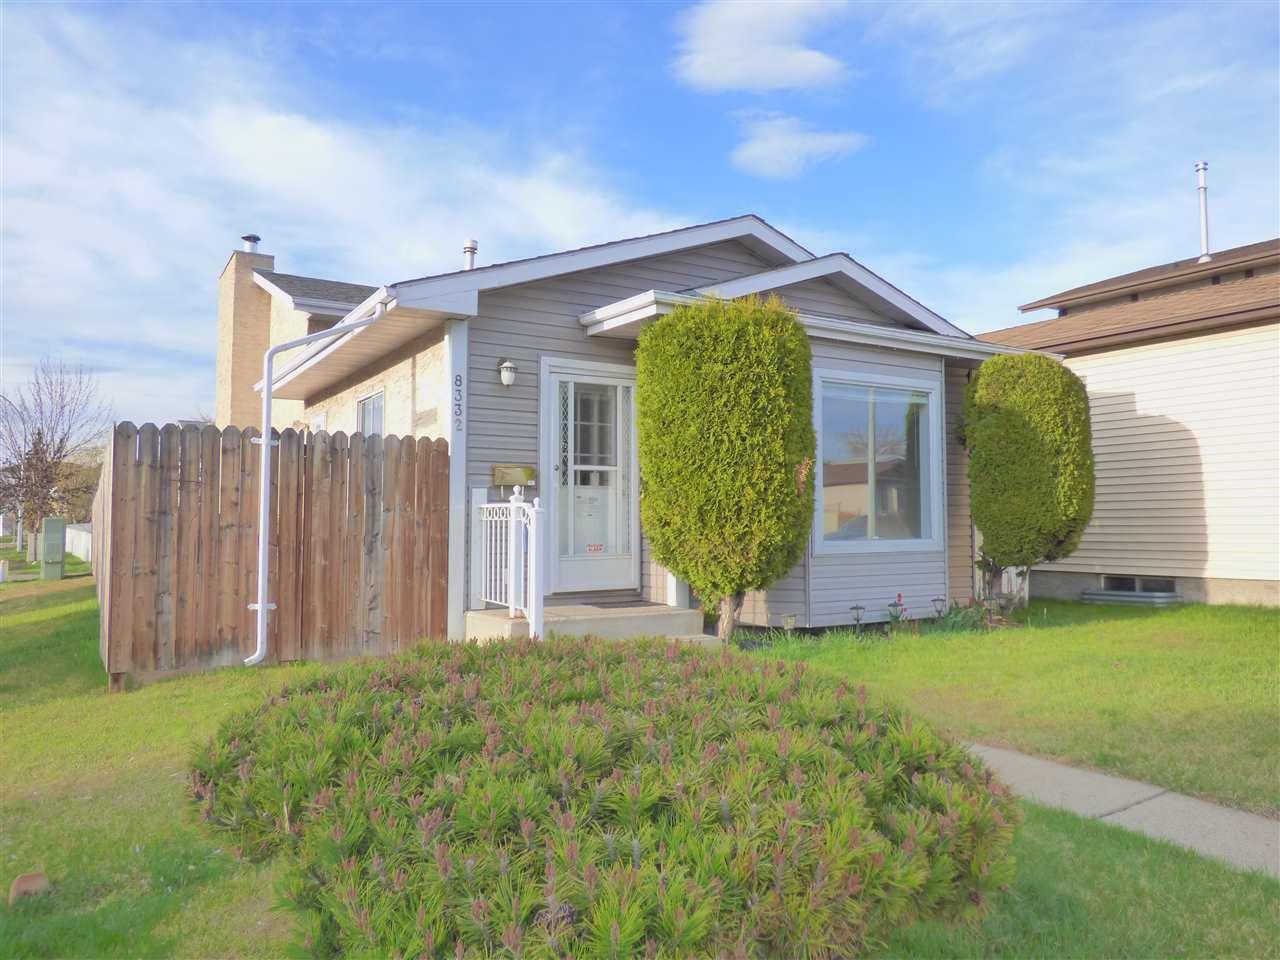 Main Photo: 8332 158 Avenue in Edmonton: Zone 28 House for sale : MLS®# E4193839